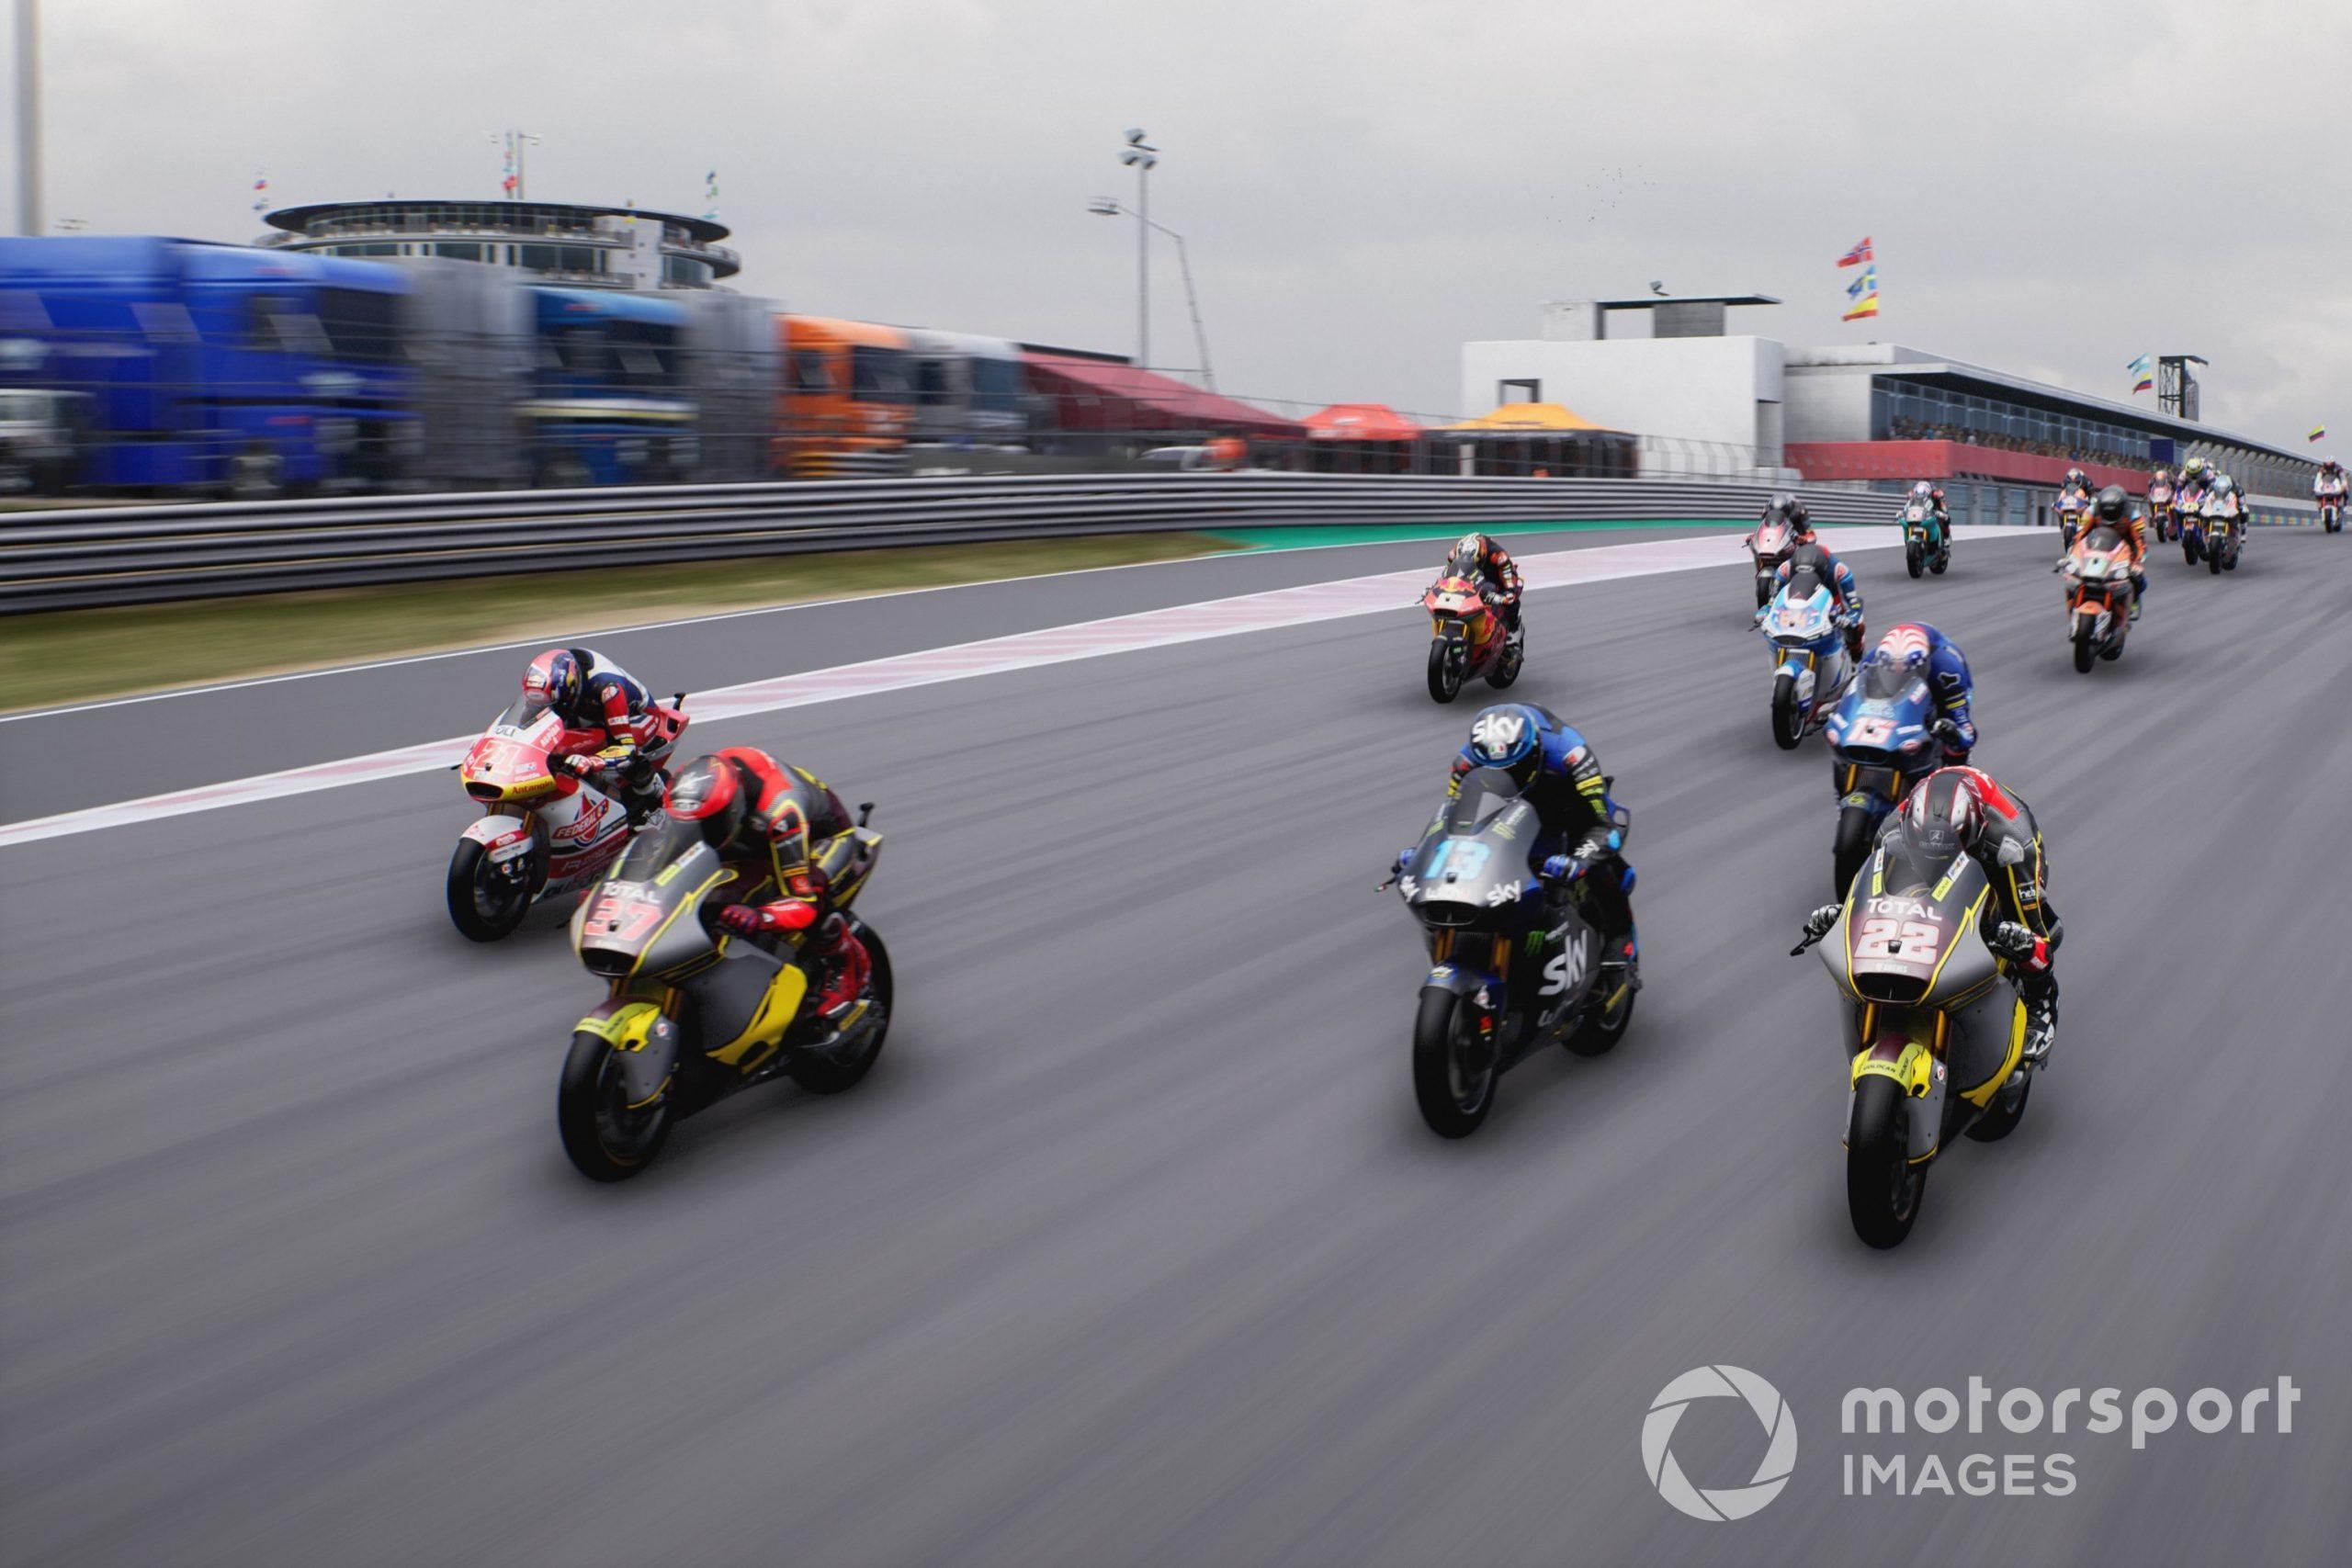 Moto2 at the Algarve International Circuit, MotoGP 21